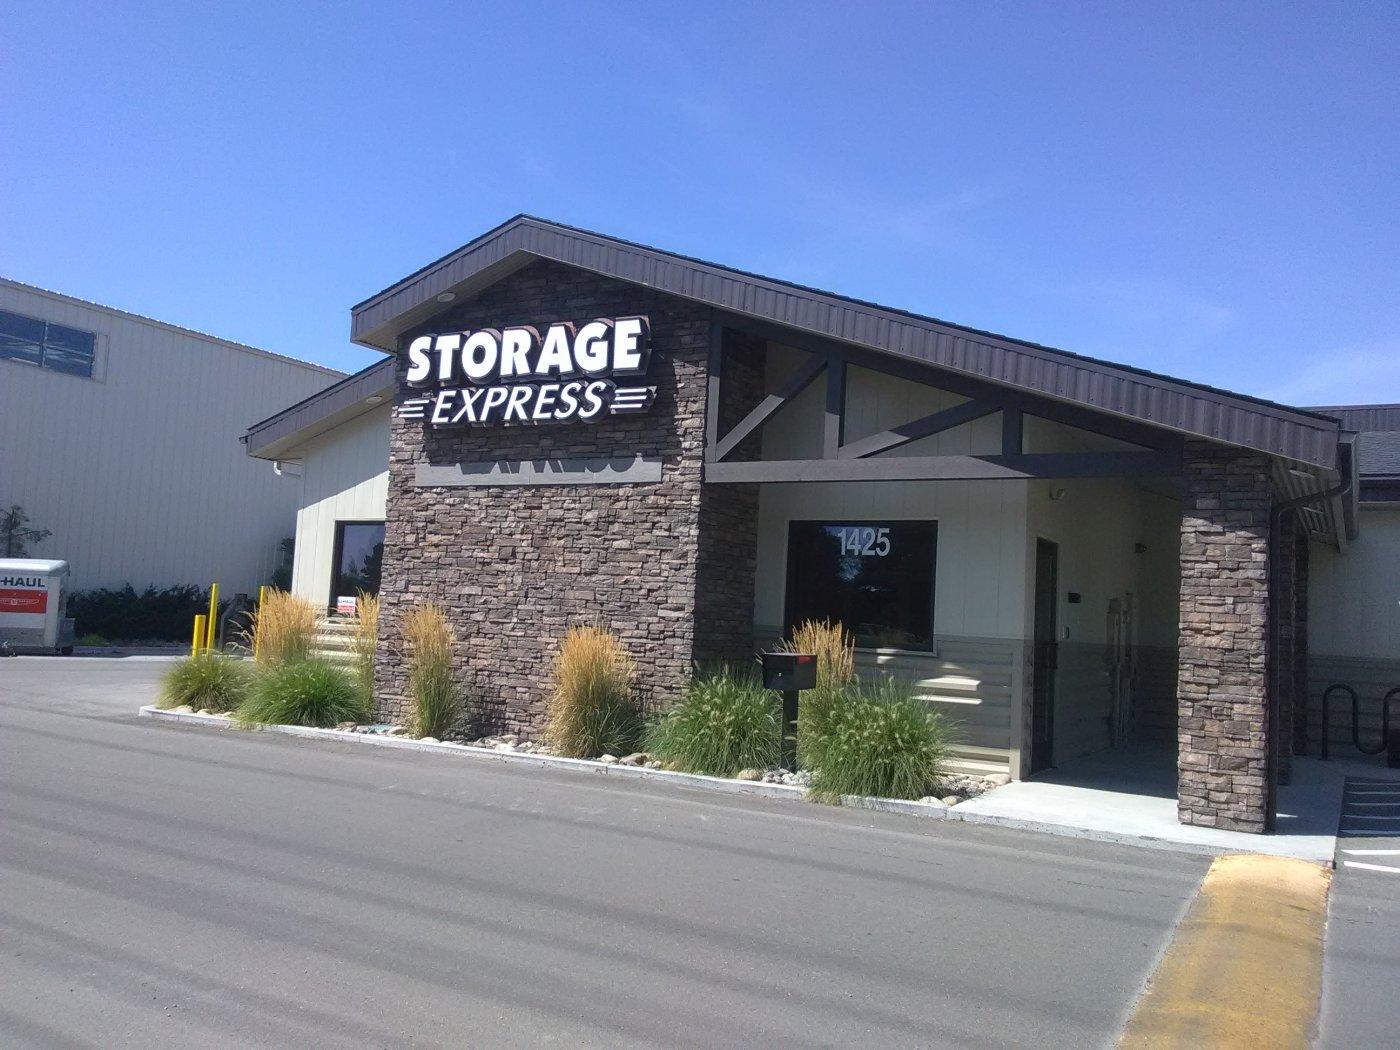 storage express exterior